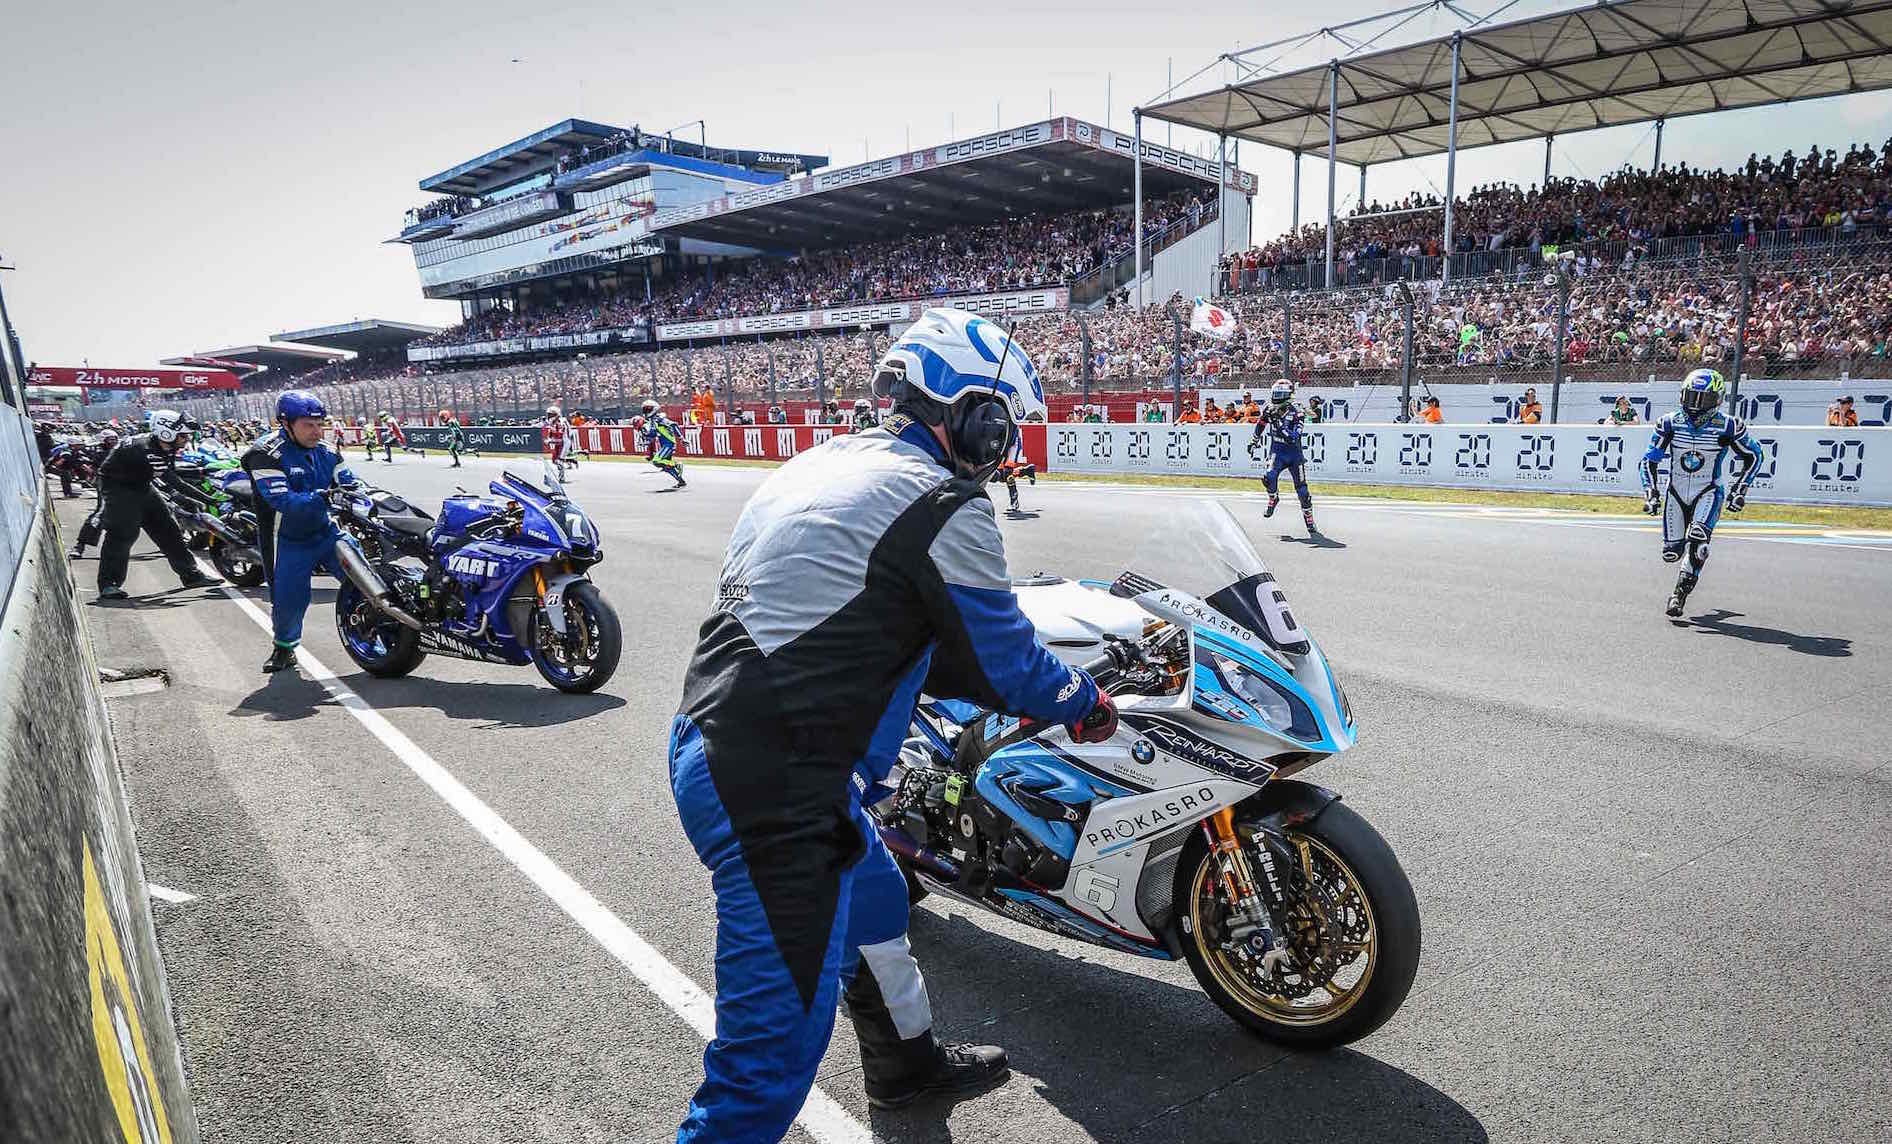 24 Heures Motos 2020 Fim Ewc Endurance World Championship